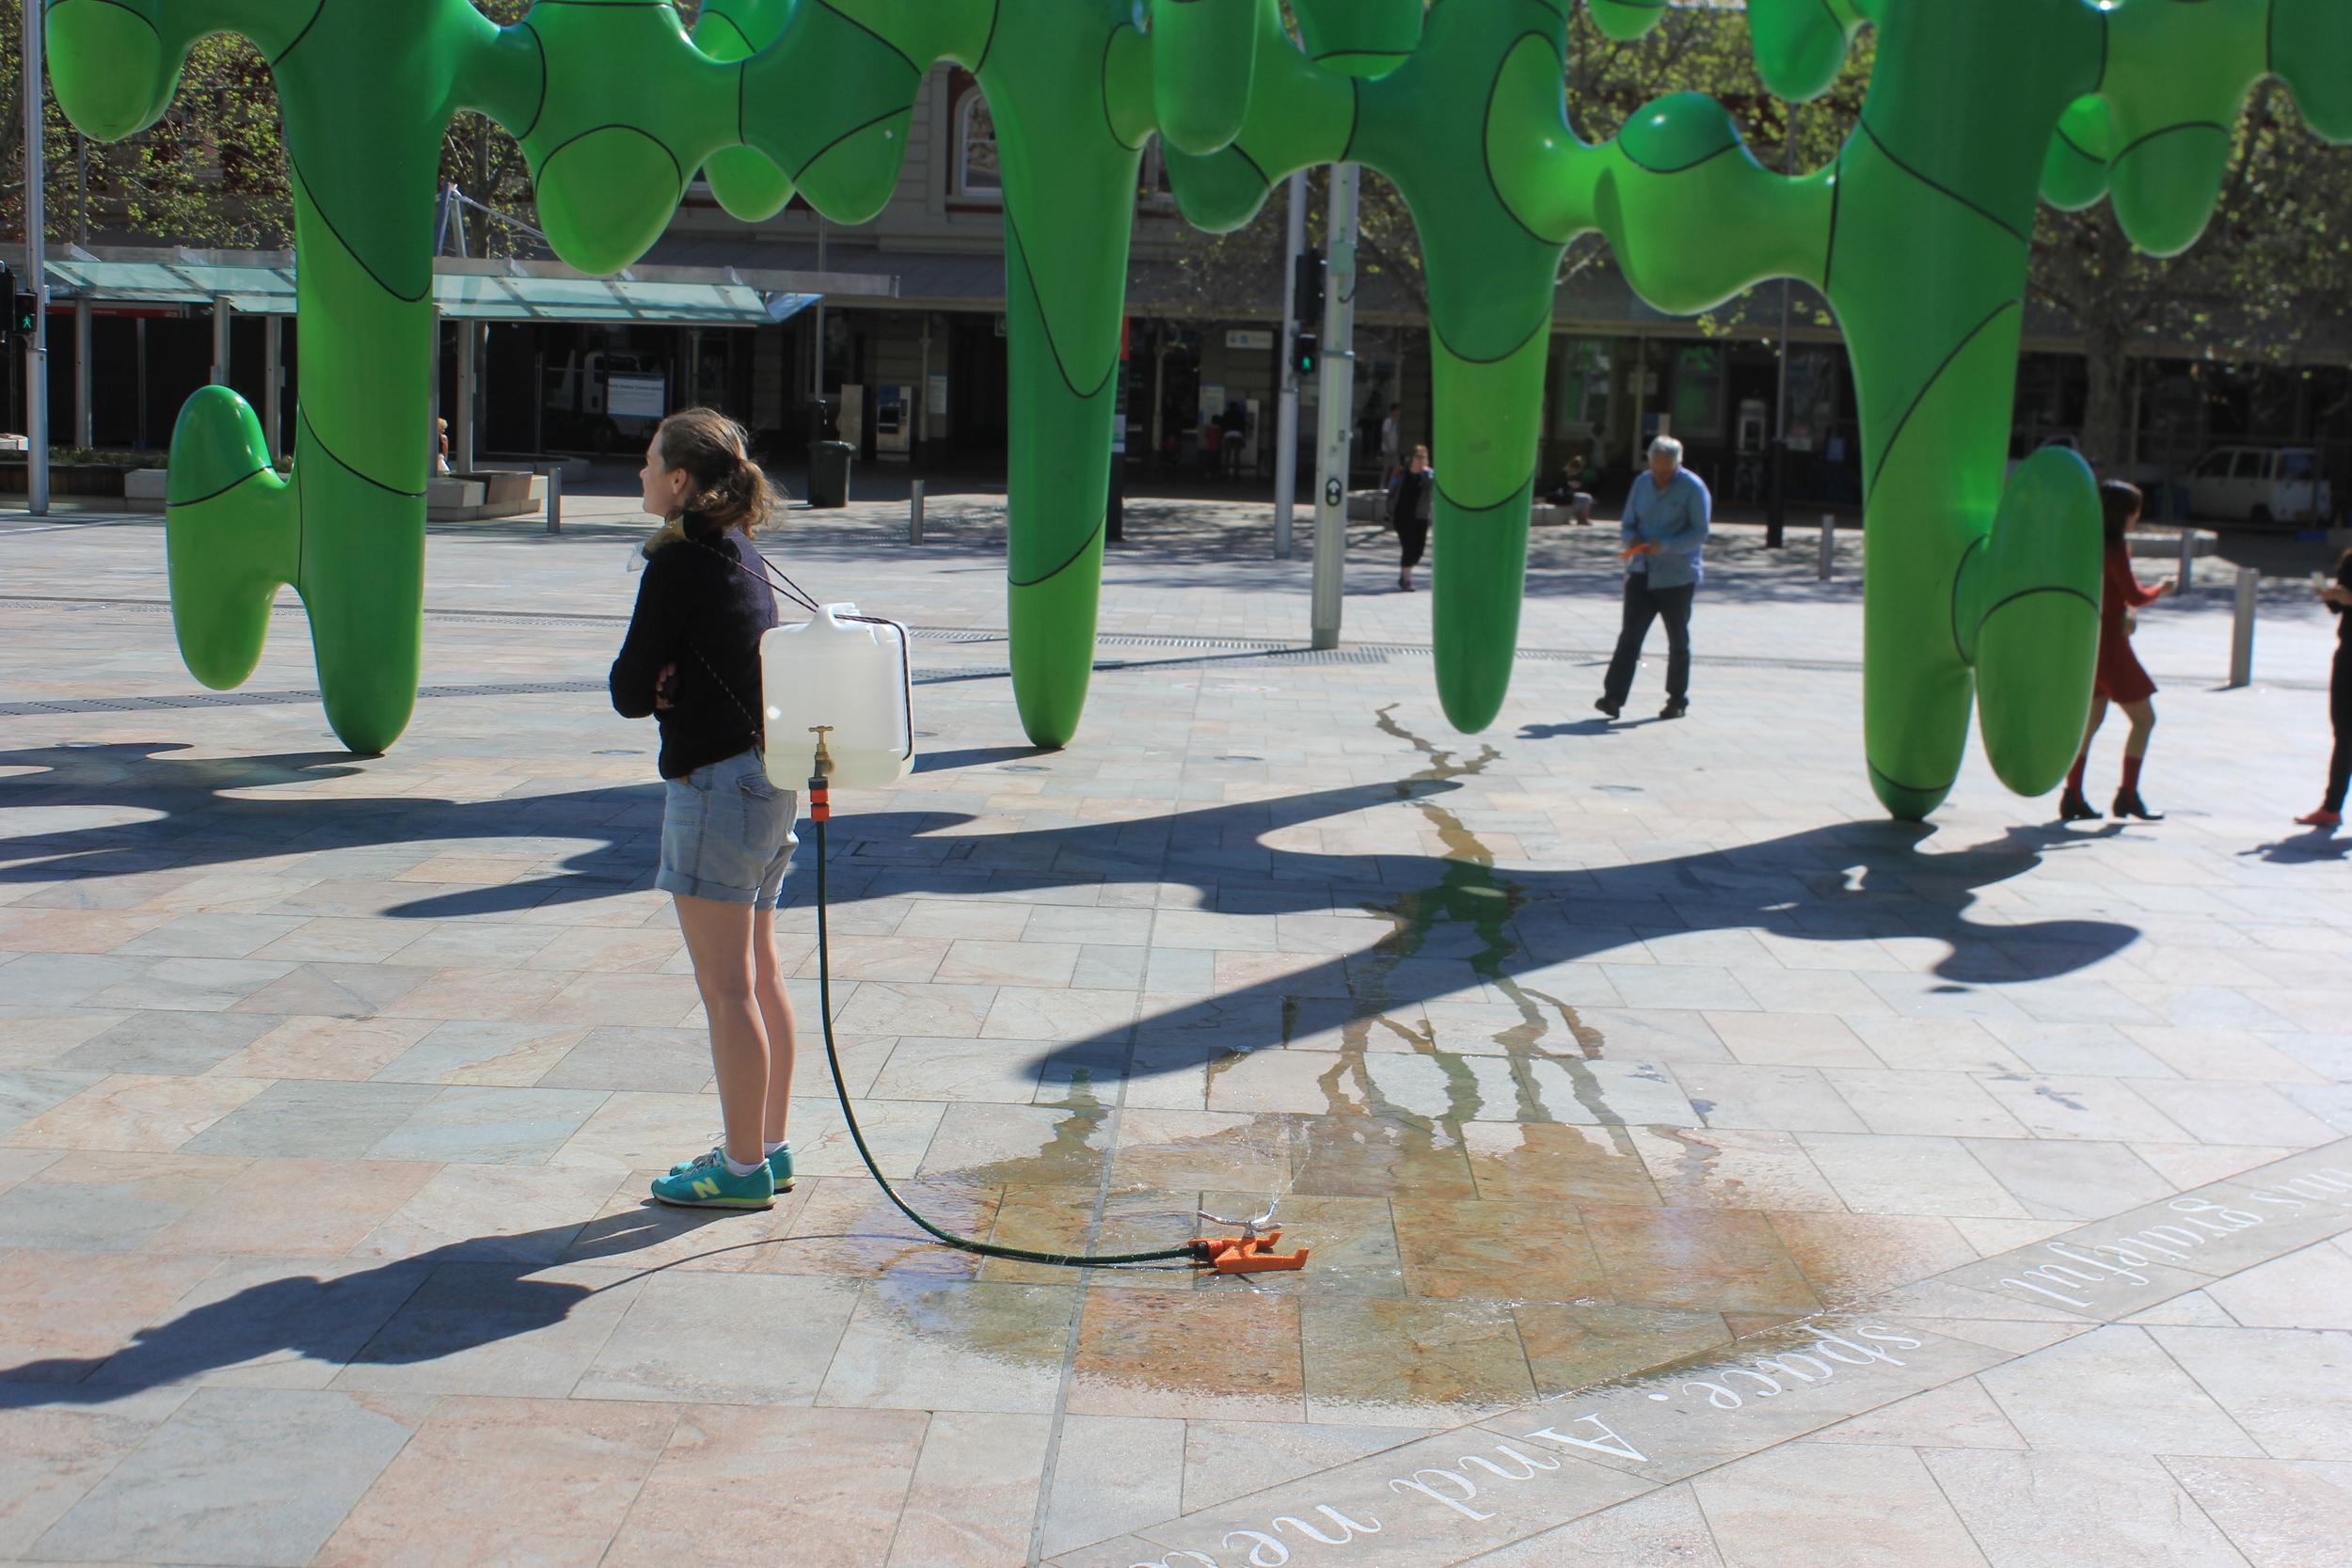 Portable Pop-Up Public Fountain